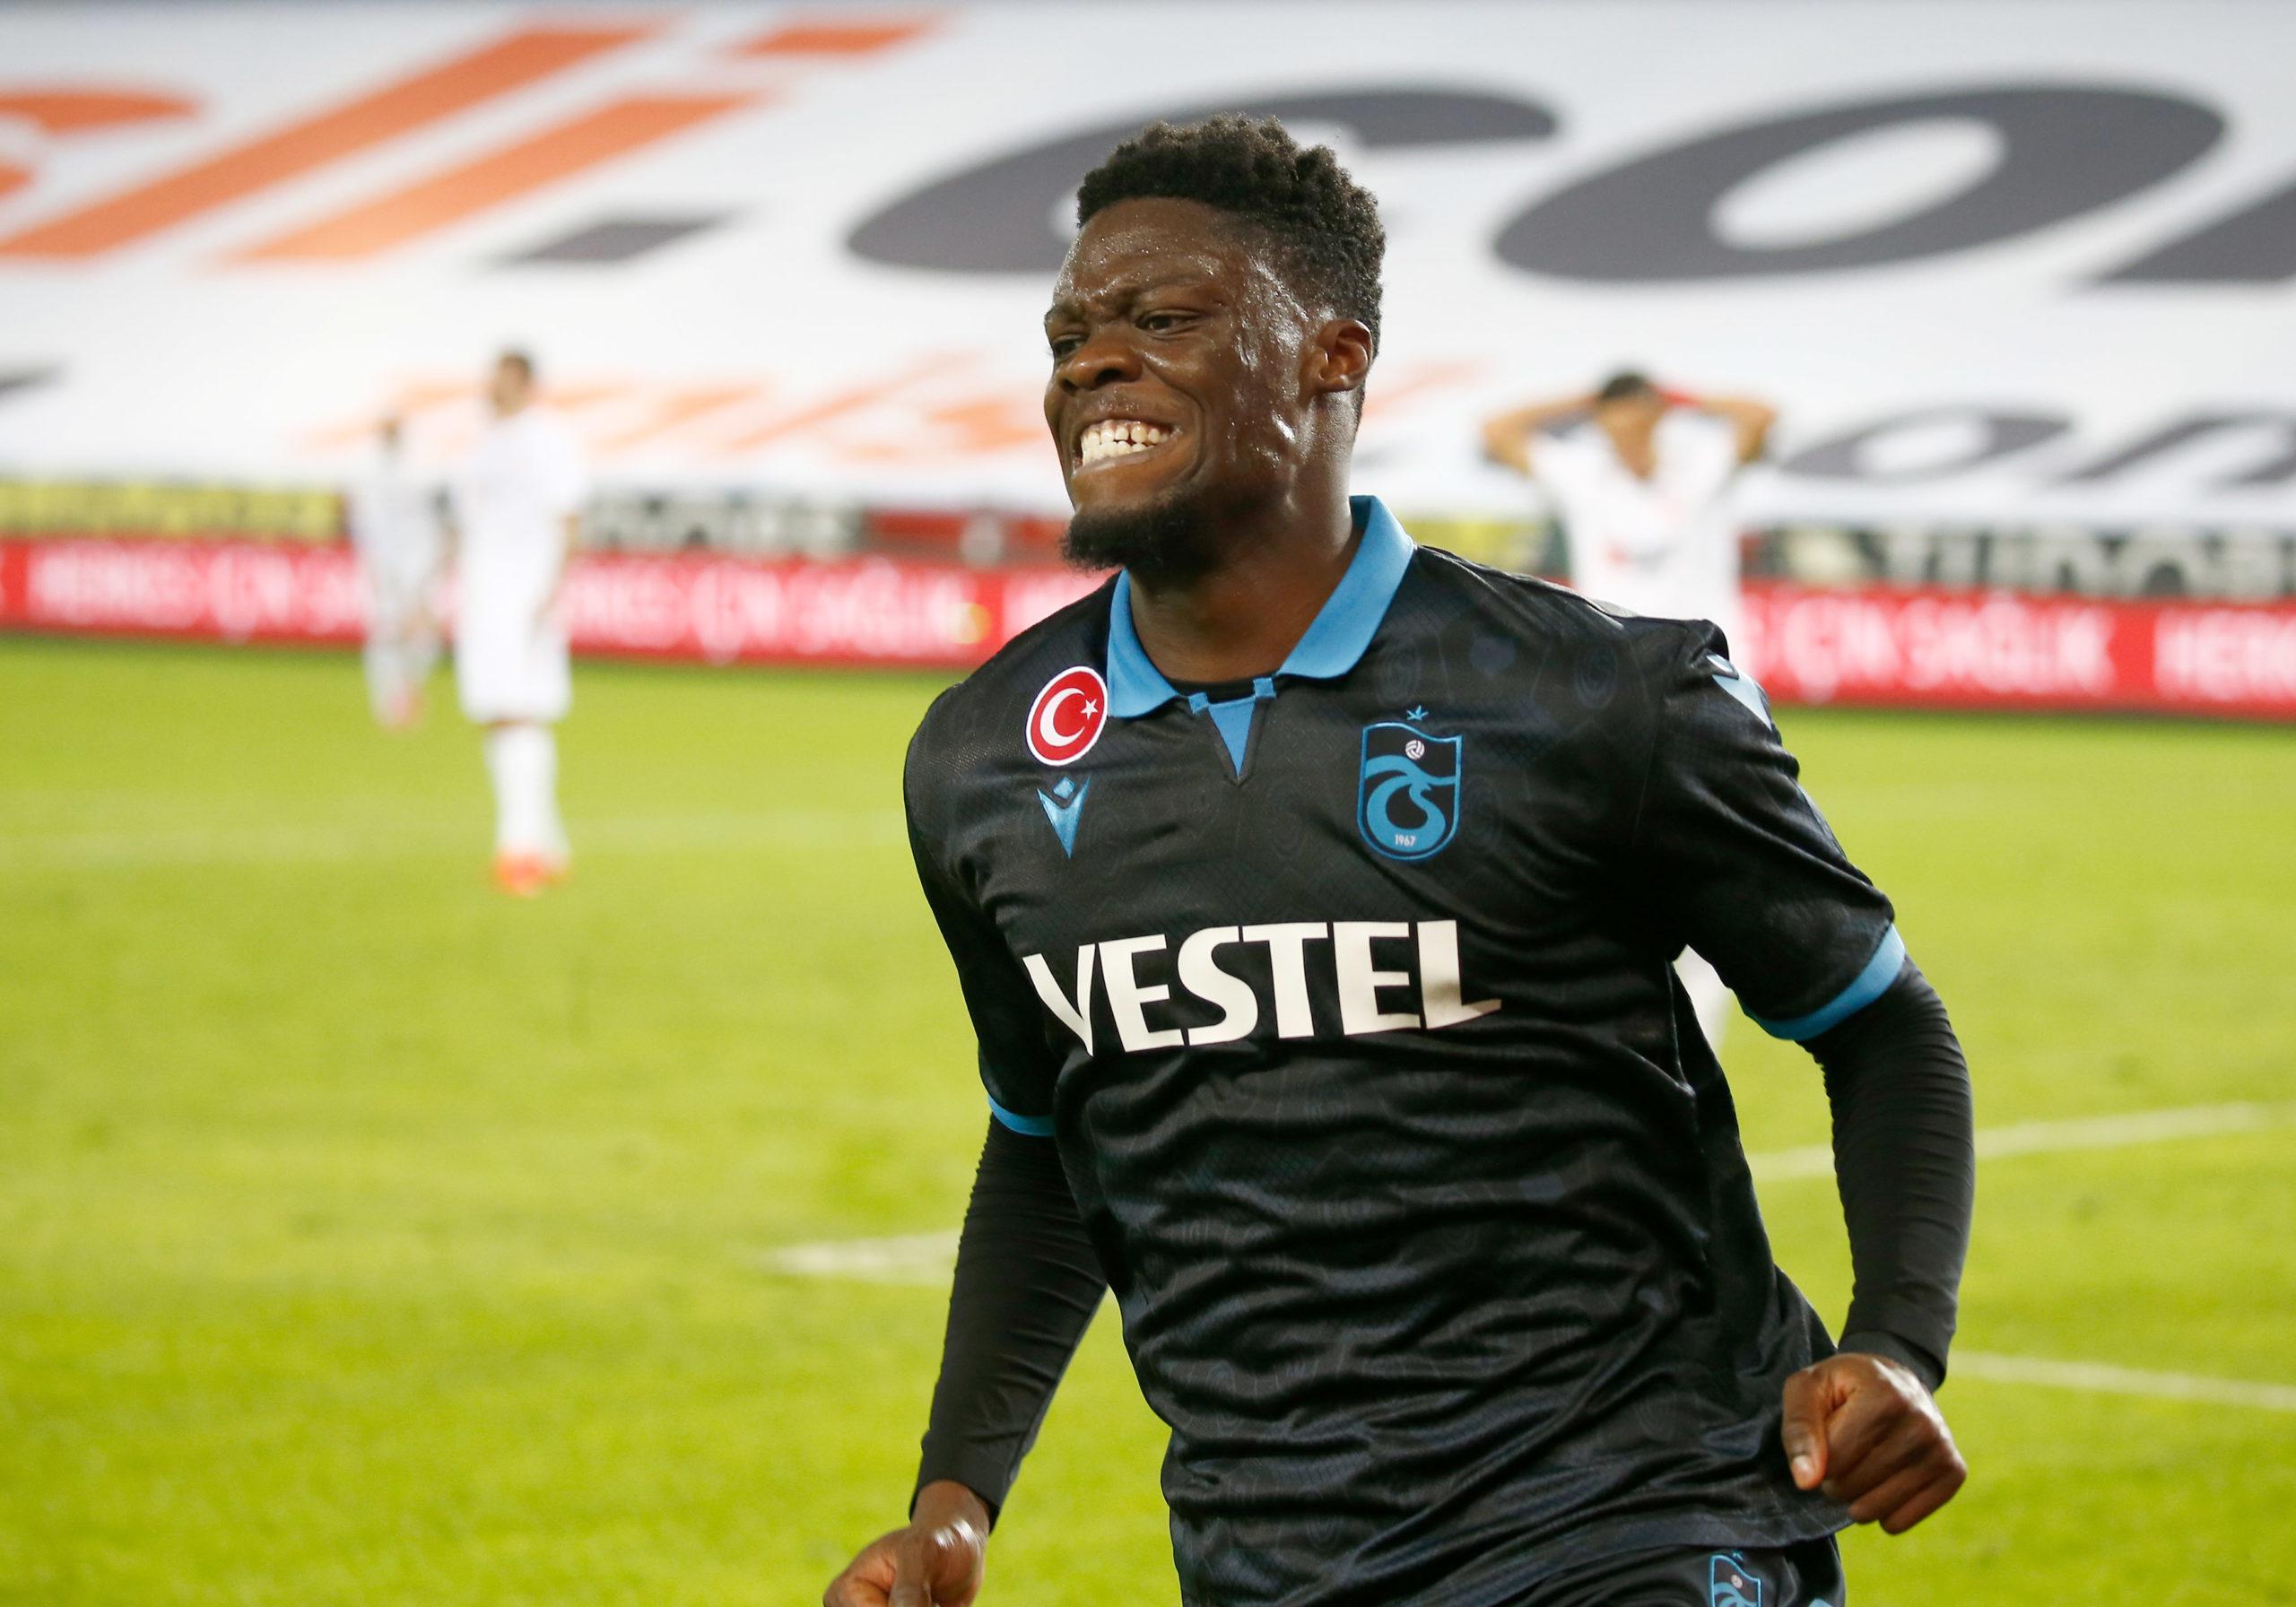 Turkey: Caleb Ekuban in the spotlight as Trabzonspor faces Sivasspor